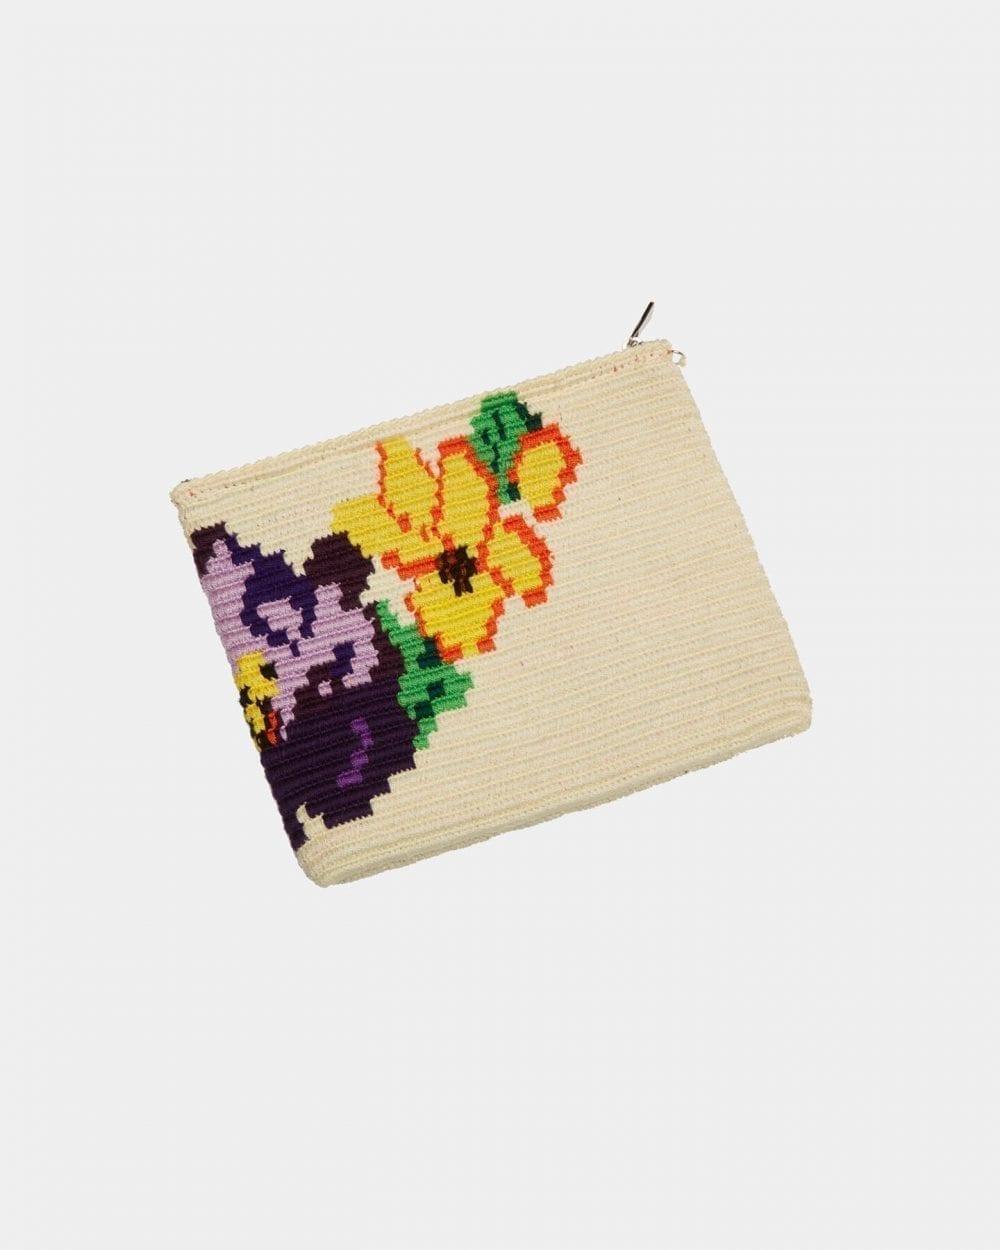 Harmony Flower clutch by ALLBYB Design, Philadelphia